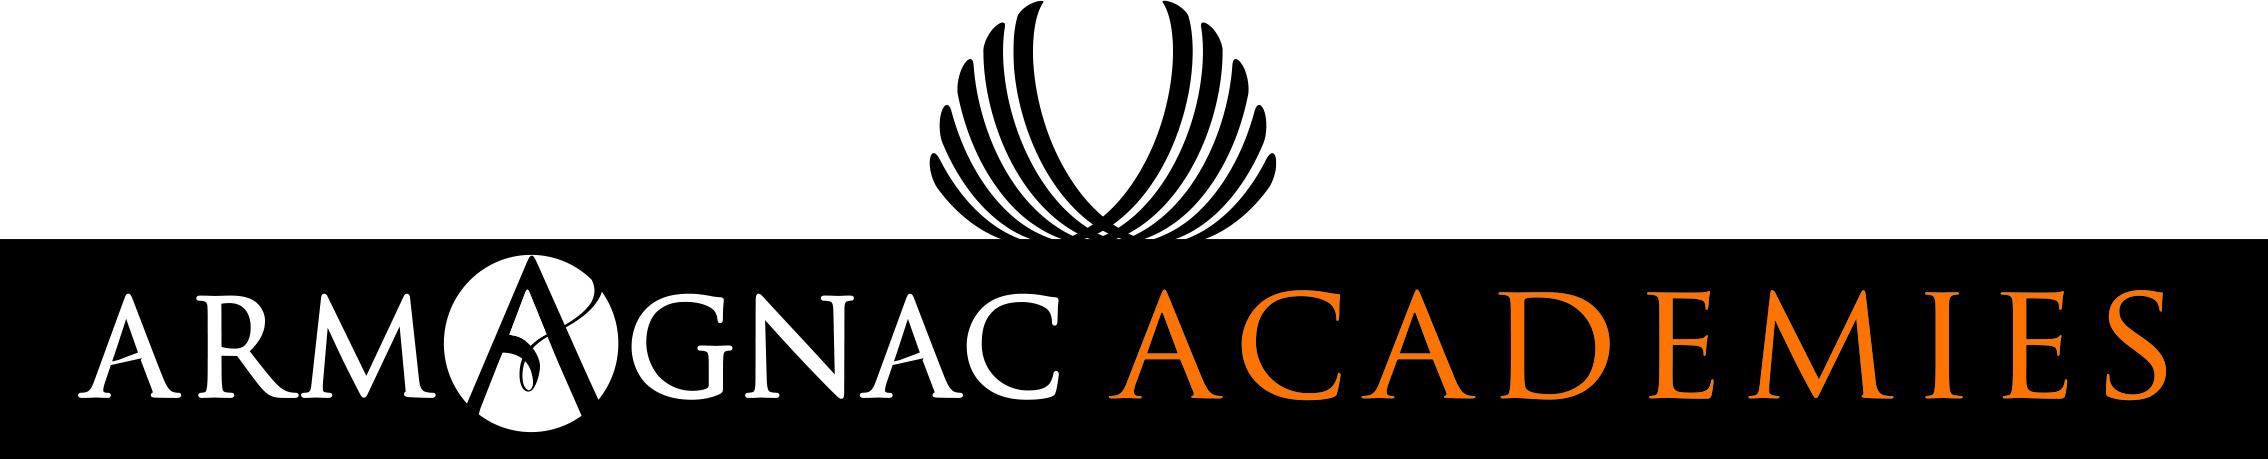 Armagnac Academies banner